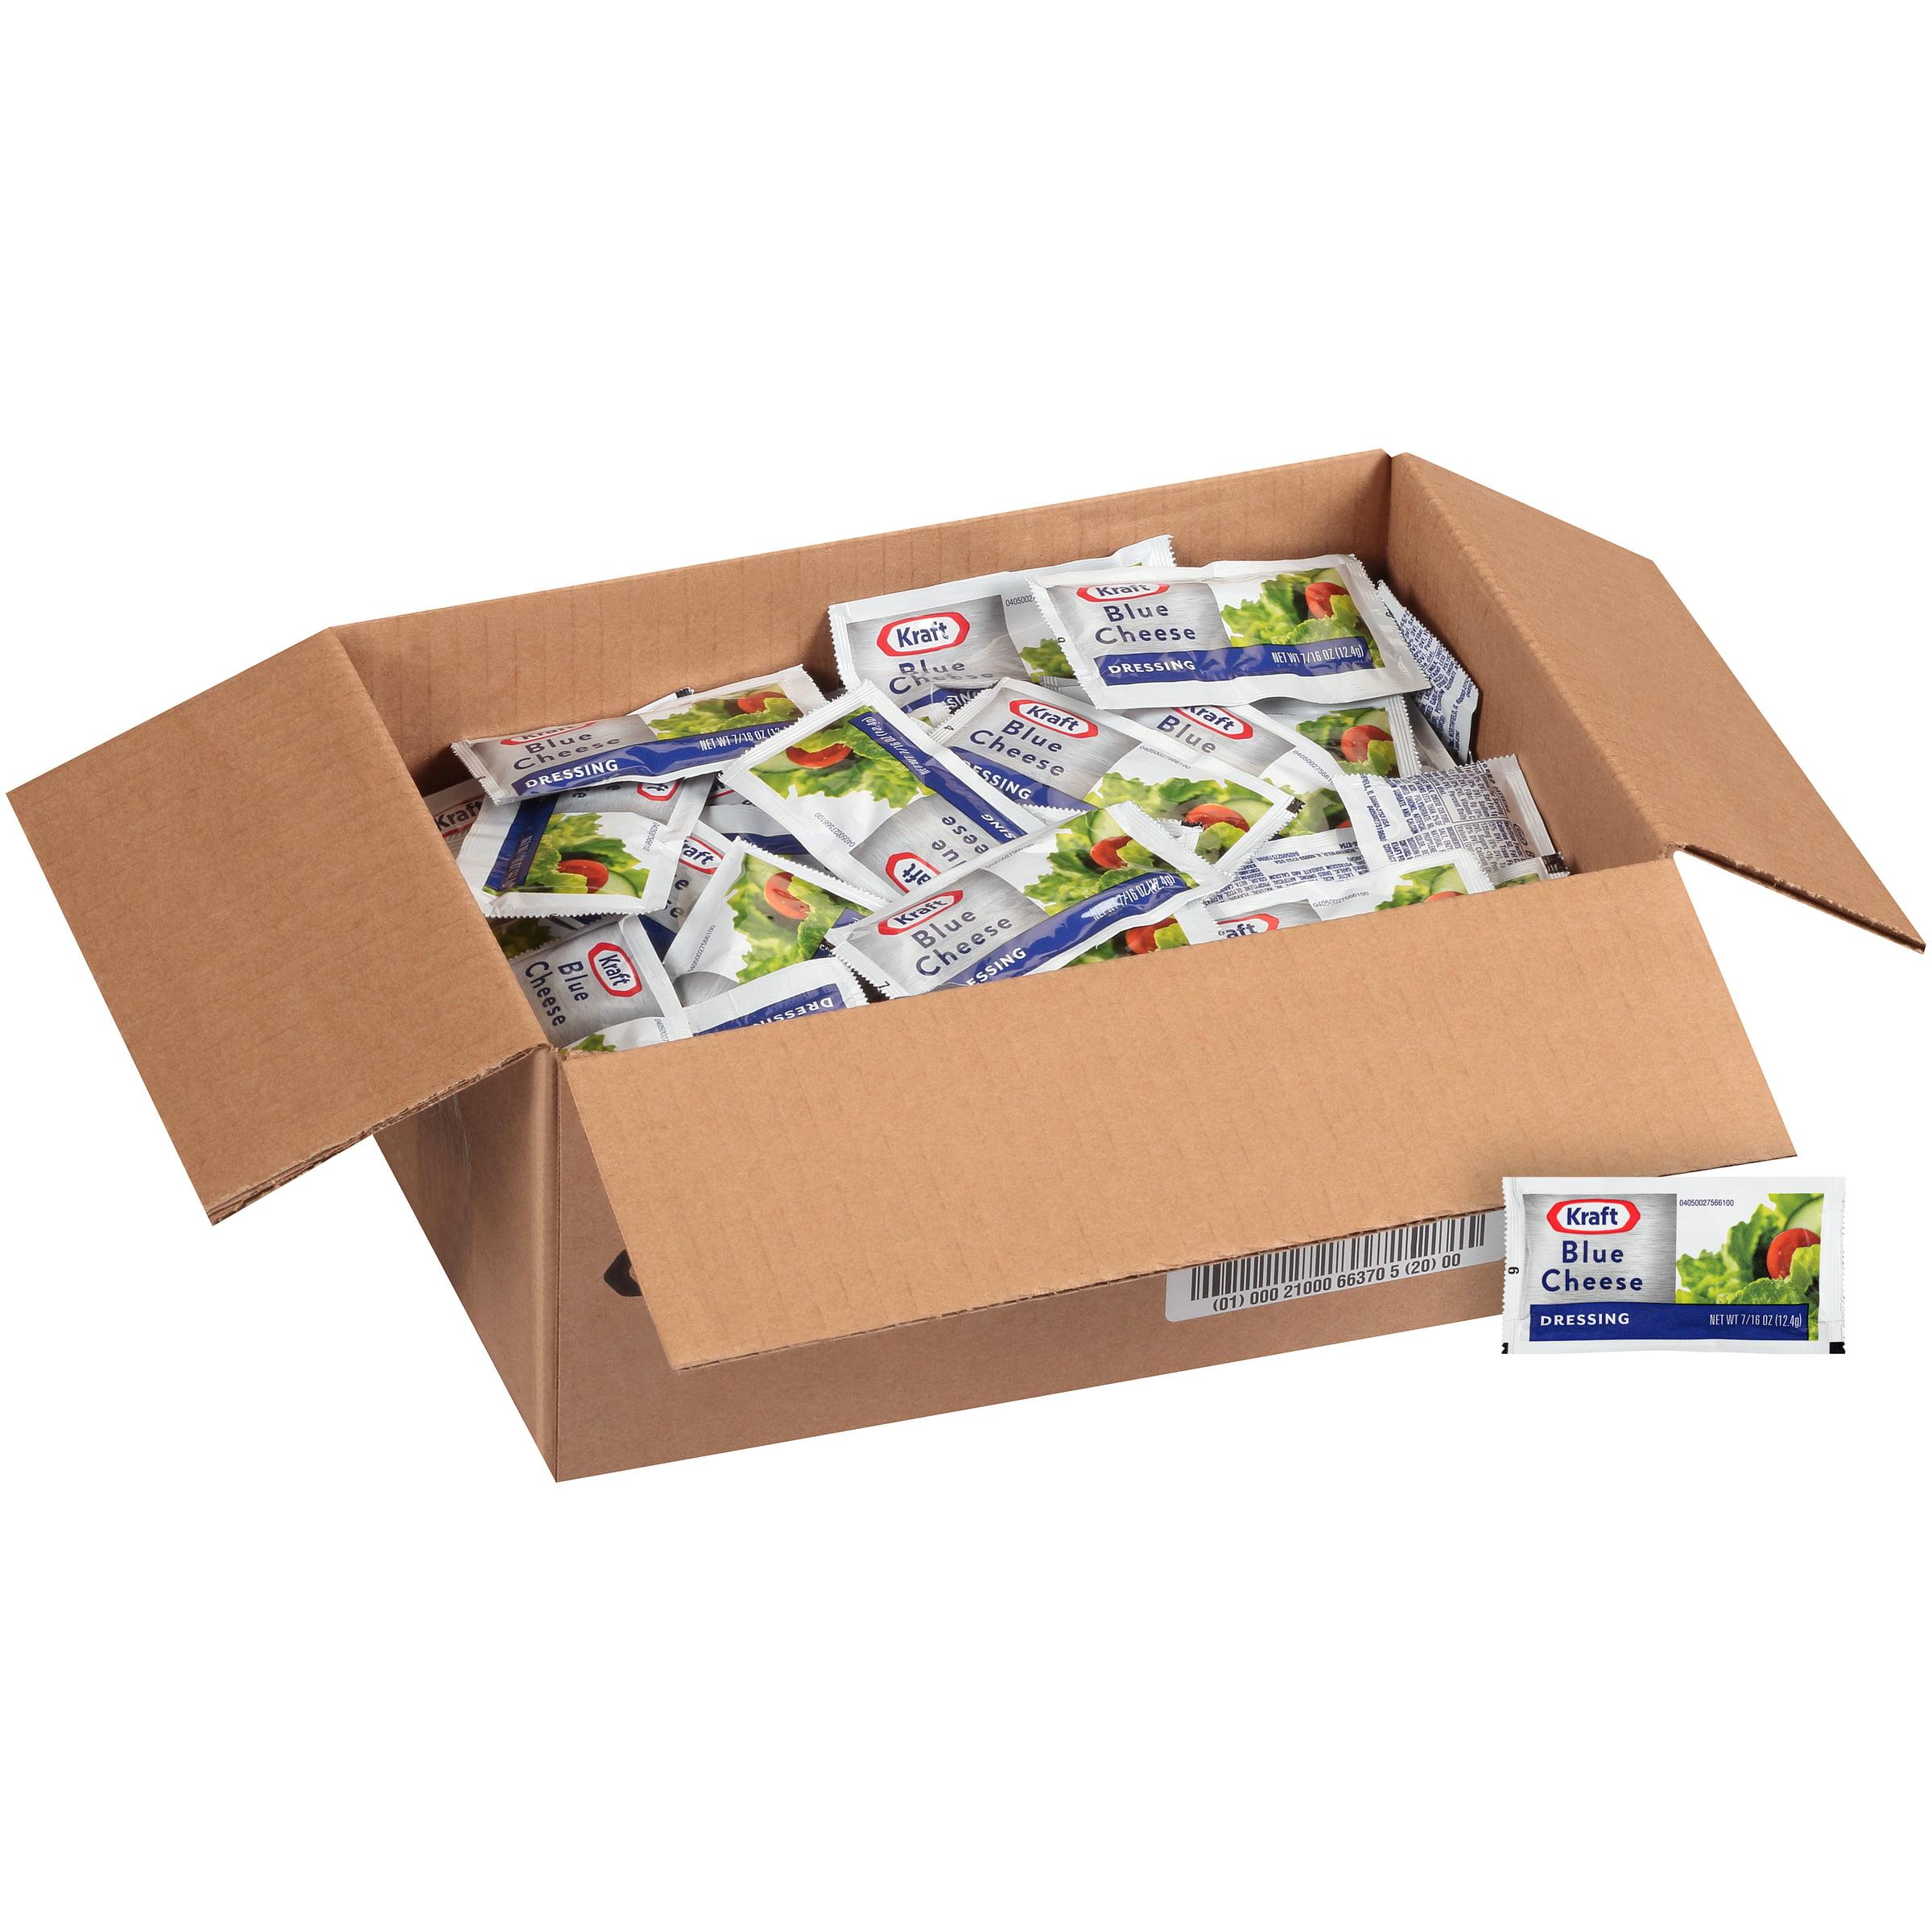 Single serve salad dressing packets